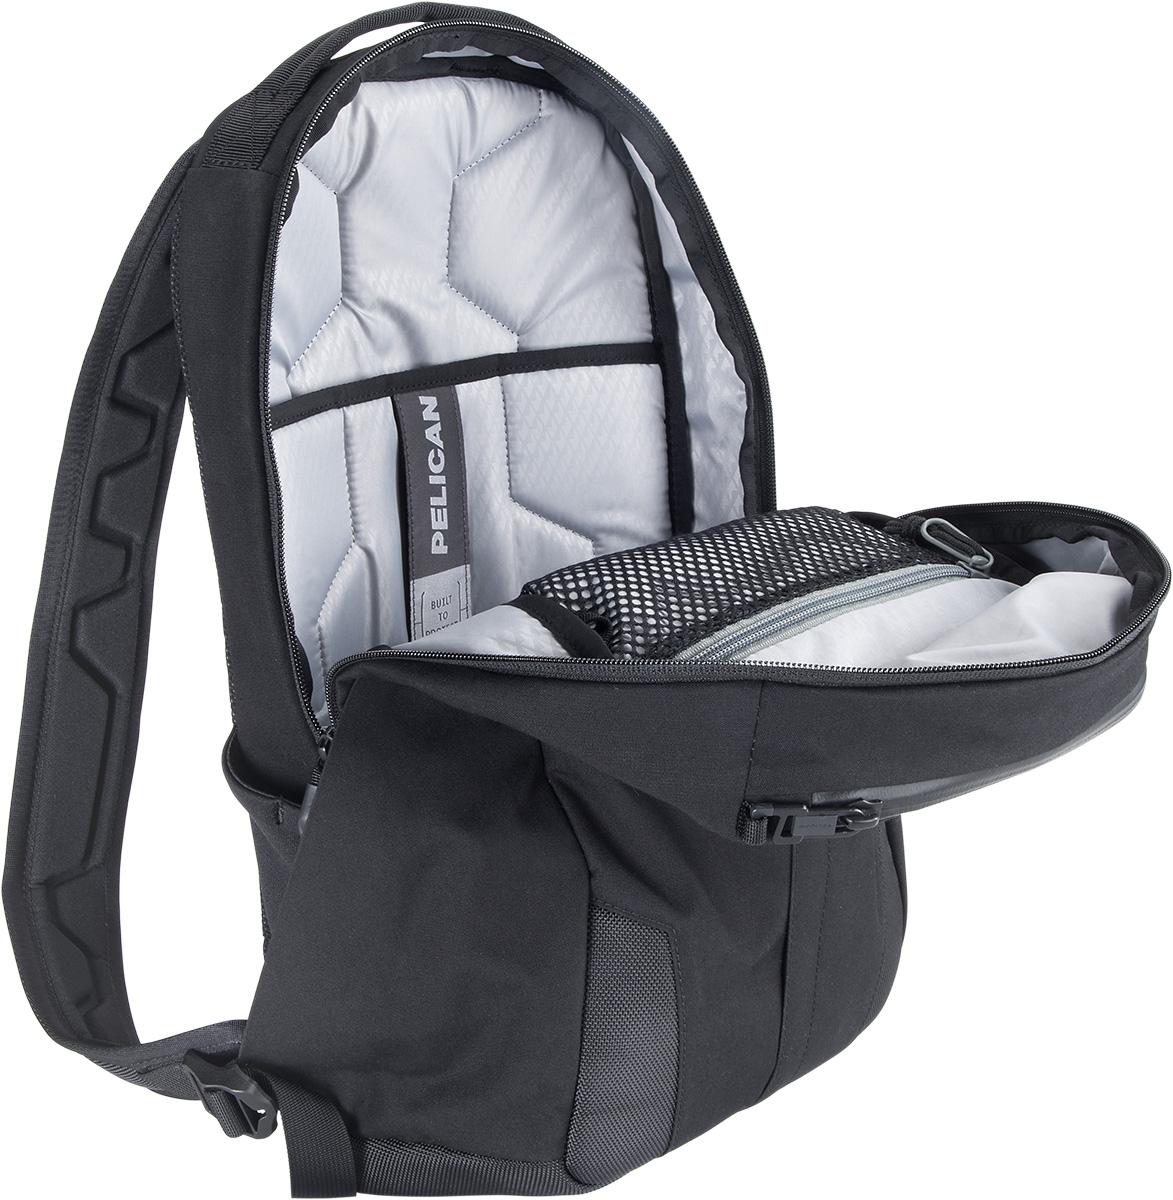 1173x1200 Mpb20 Backpacks Amp Bags